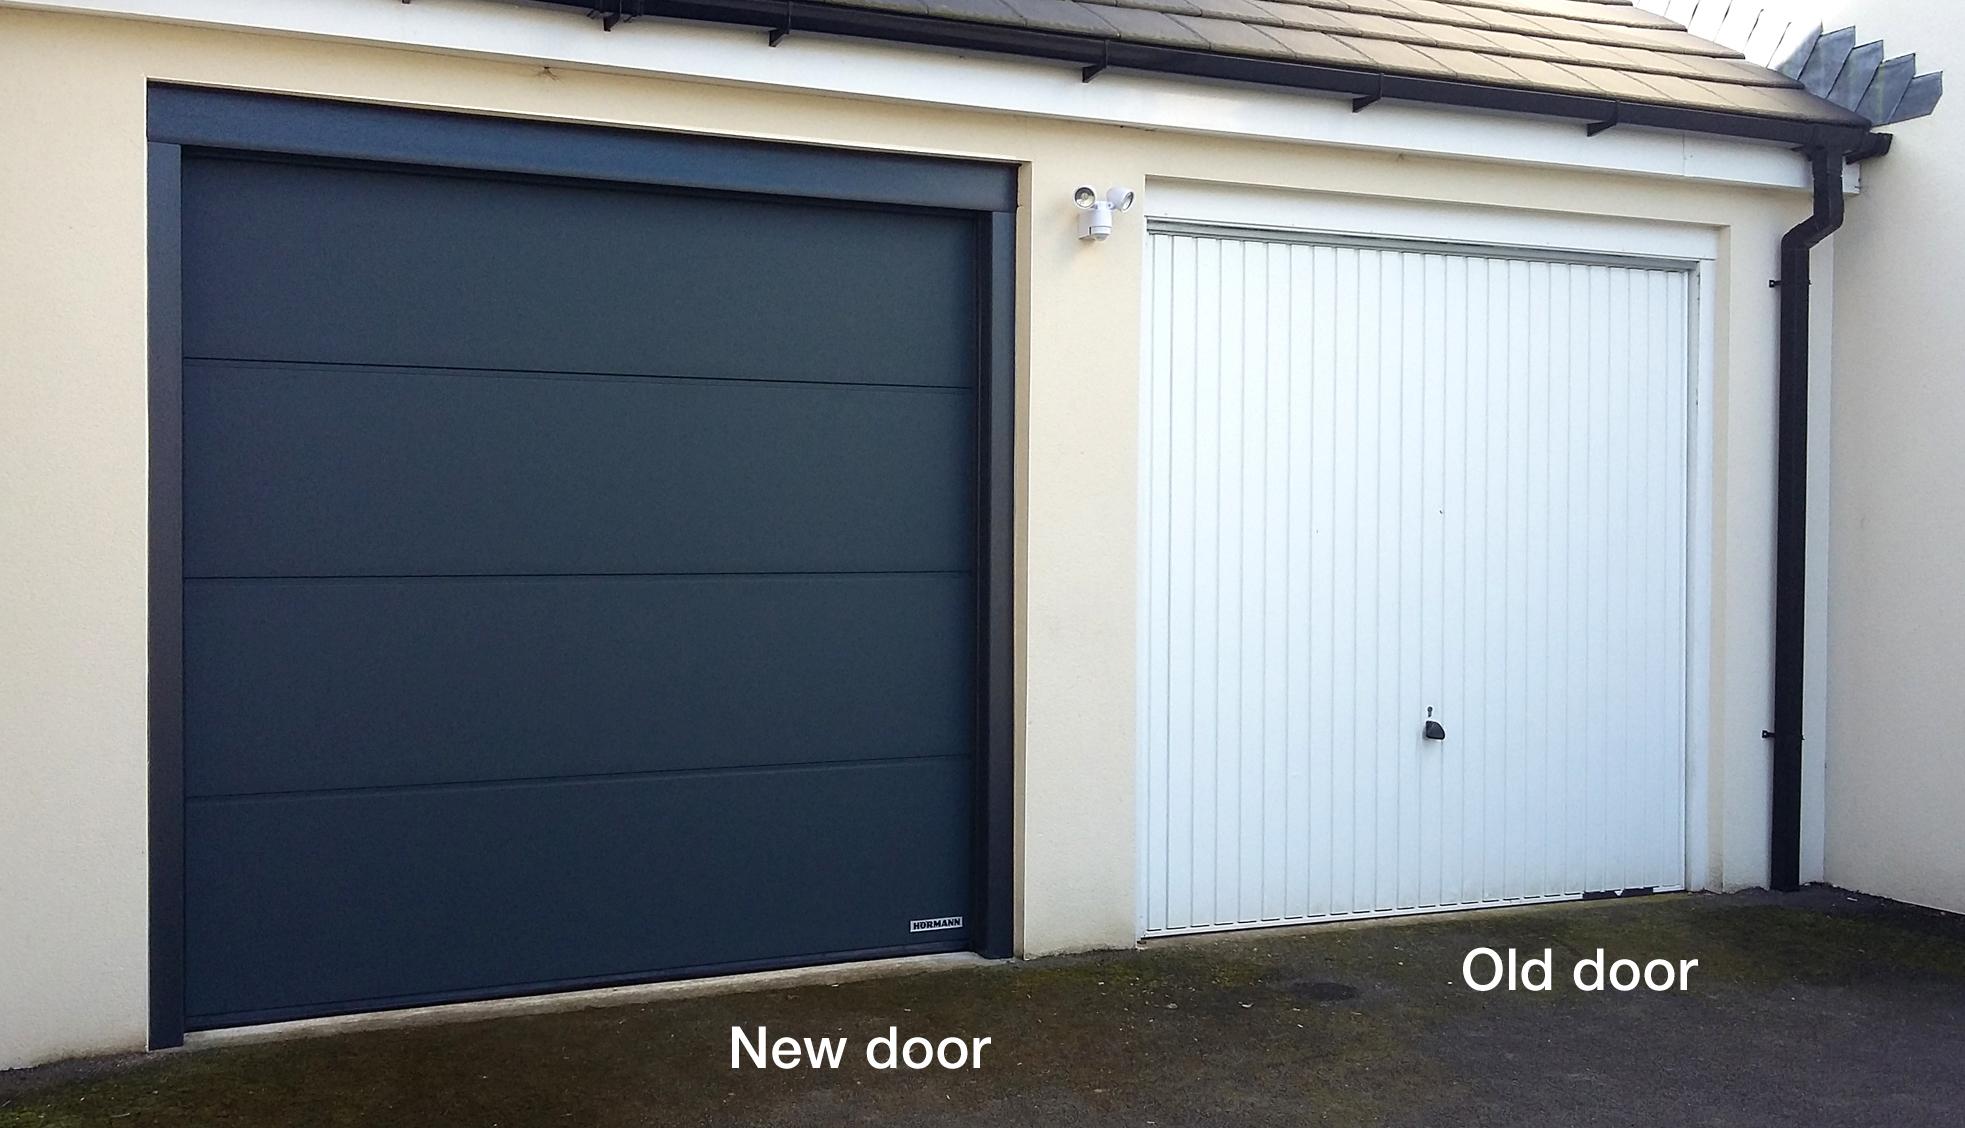 H 246 Rmann Sectional Doors Strines Marple Pennine Garage